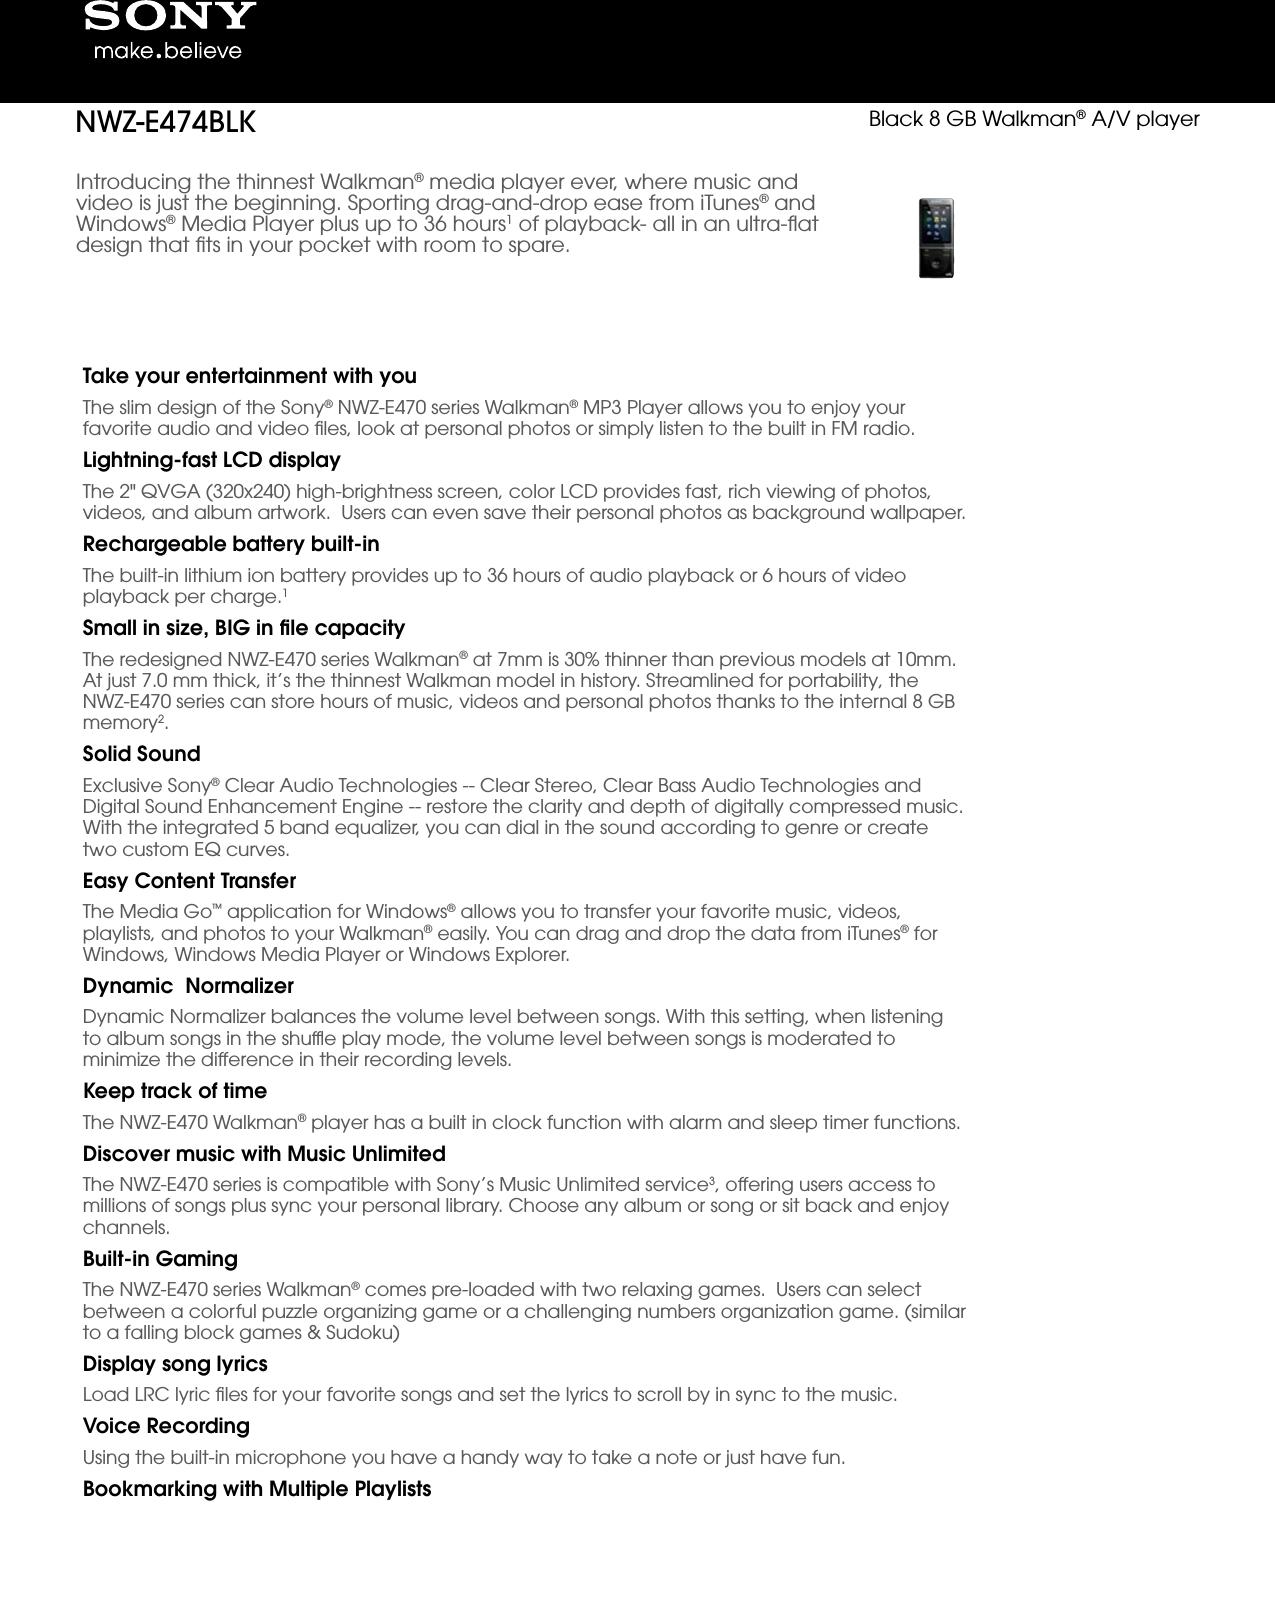 Sony NWZ E474 User Manual Marketing Specifications (Black